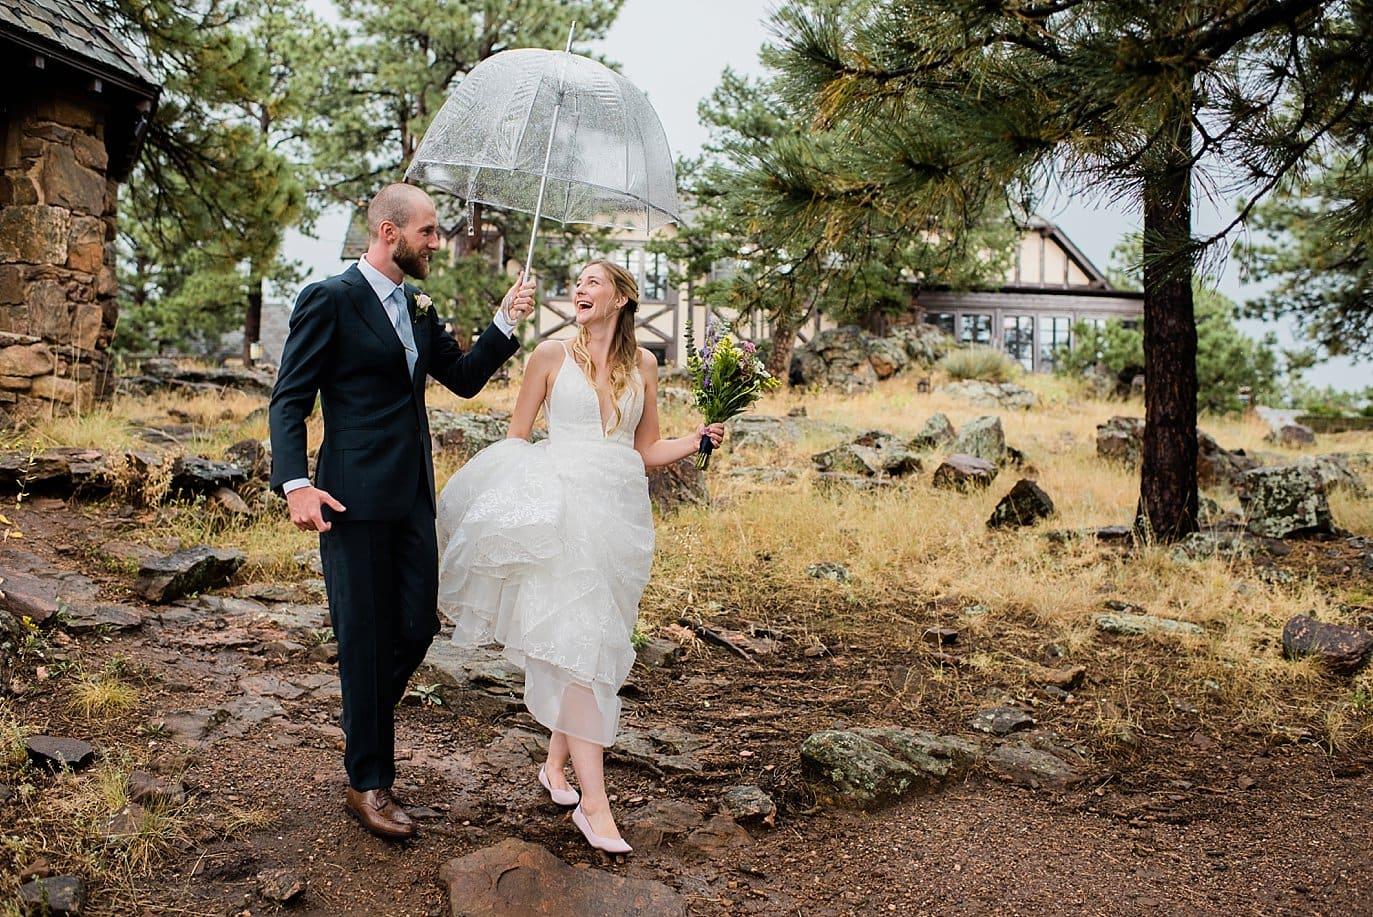 bride and groom with umbrella at rainy Boettcher Mansion wedding